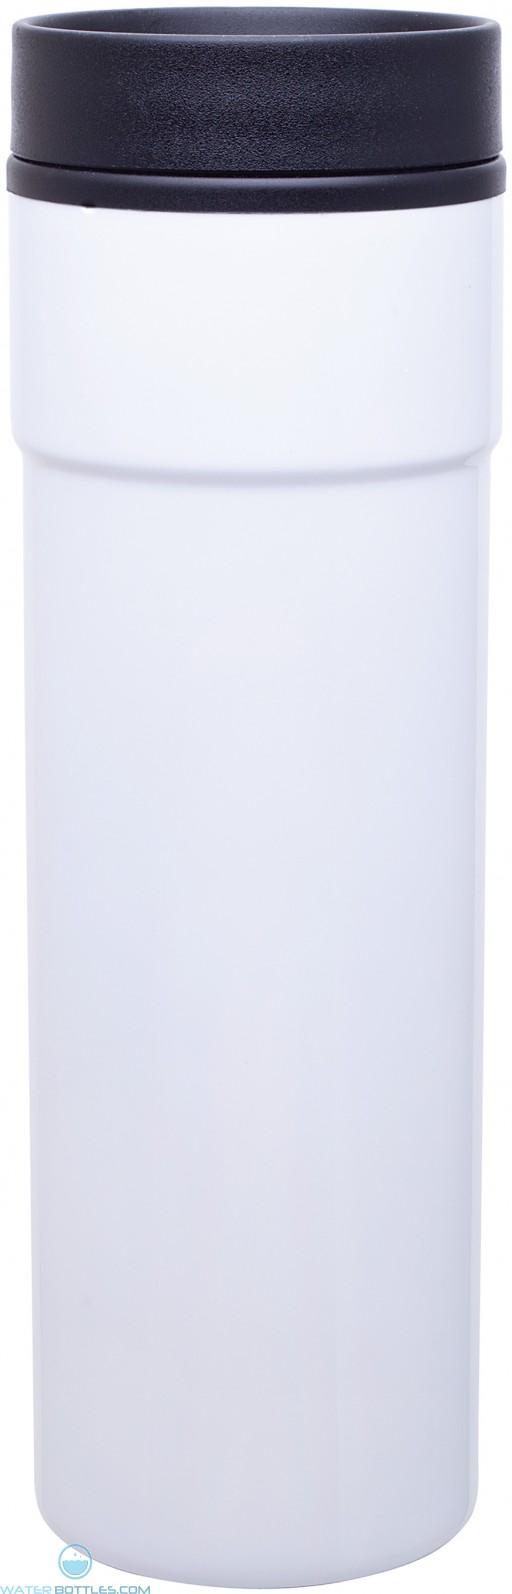 Foam Insulated Como Tumblers | 16 oz - White